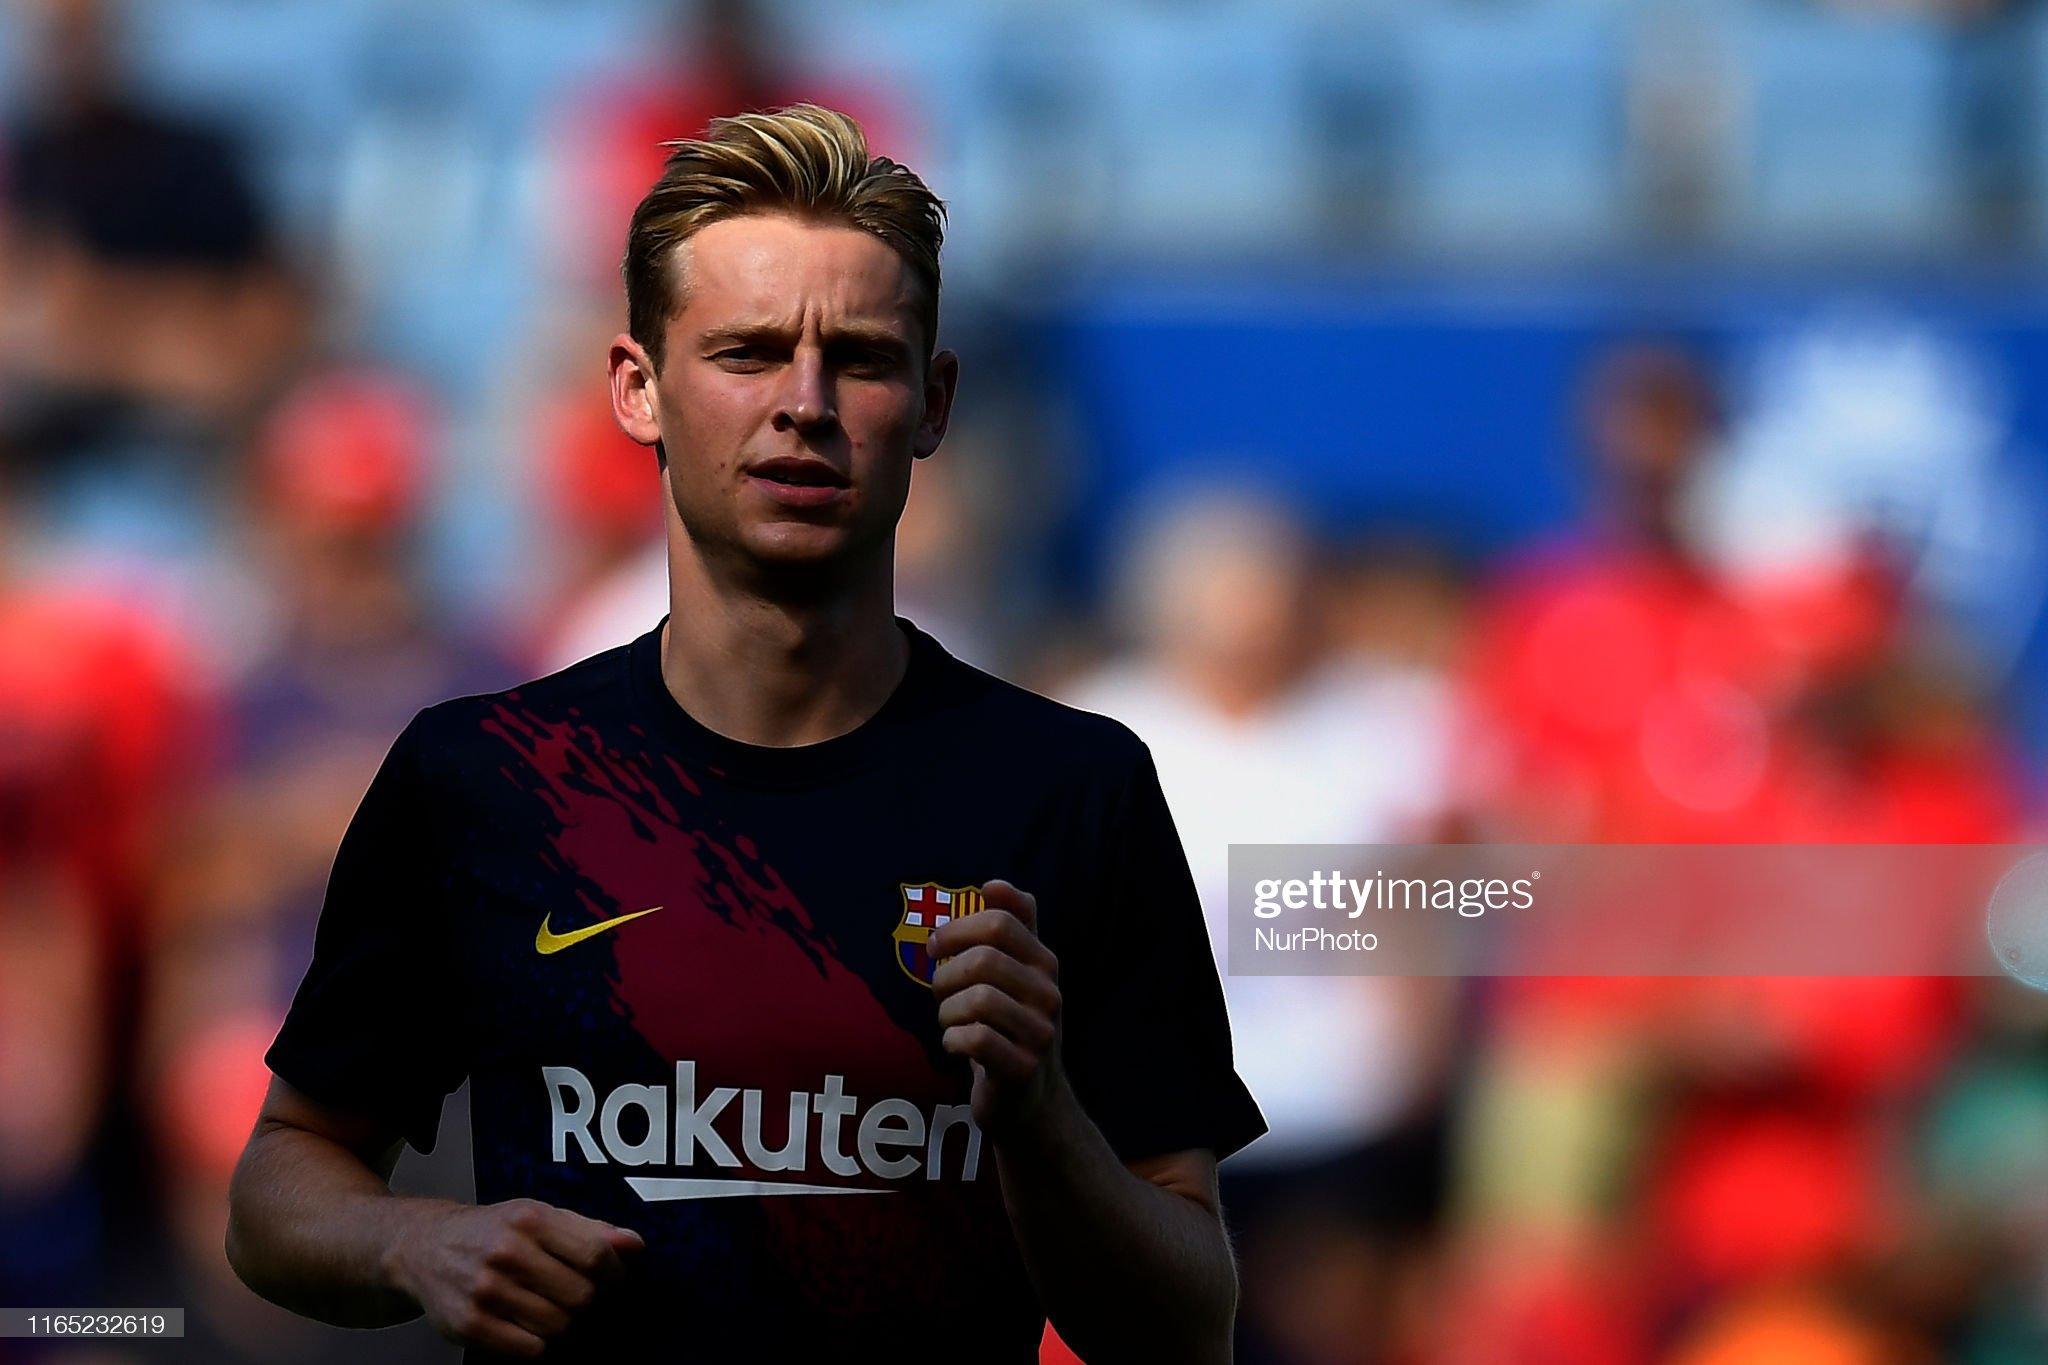 صور مباراة : أوساسونا - برشلونة 2-2 ( 31-08-2019 )  Frenkie-de-jong-of-barcelona-during-the-warmup-before-the-liga-match-picture-id1165232619?s=2048x2048